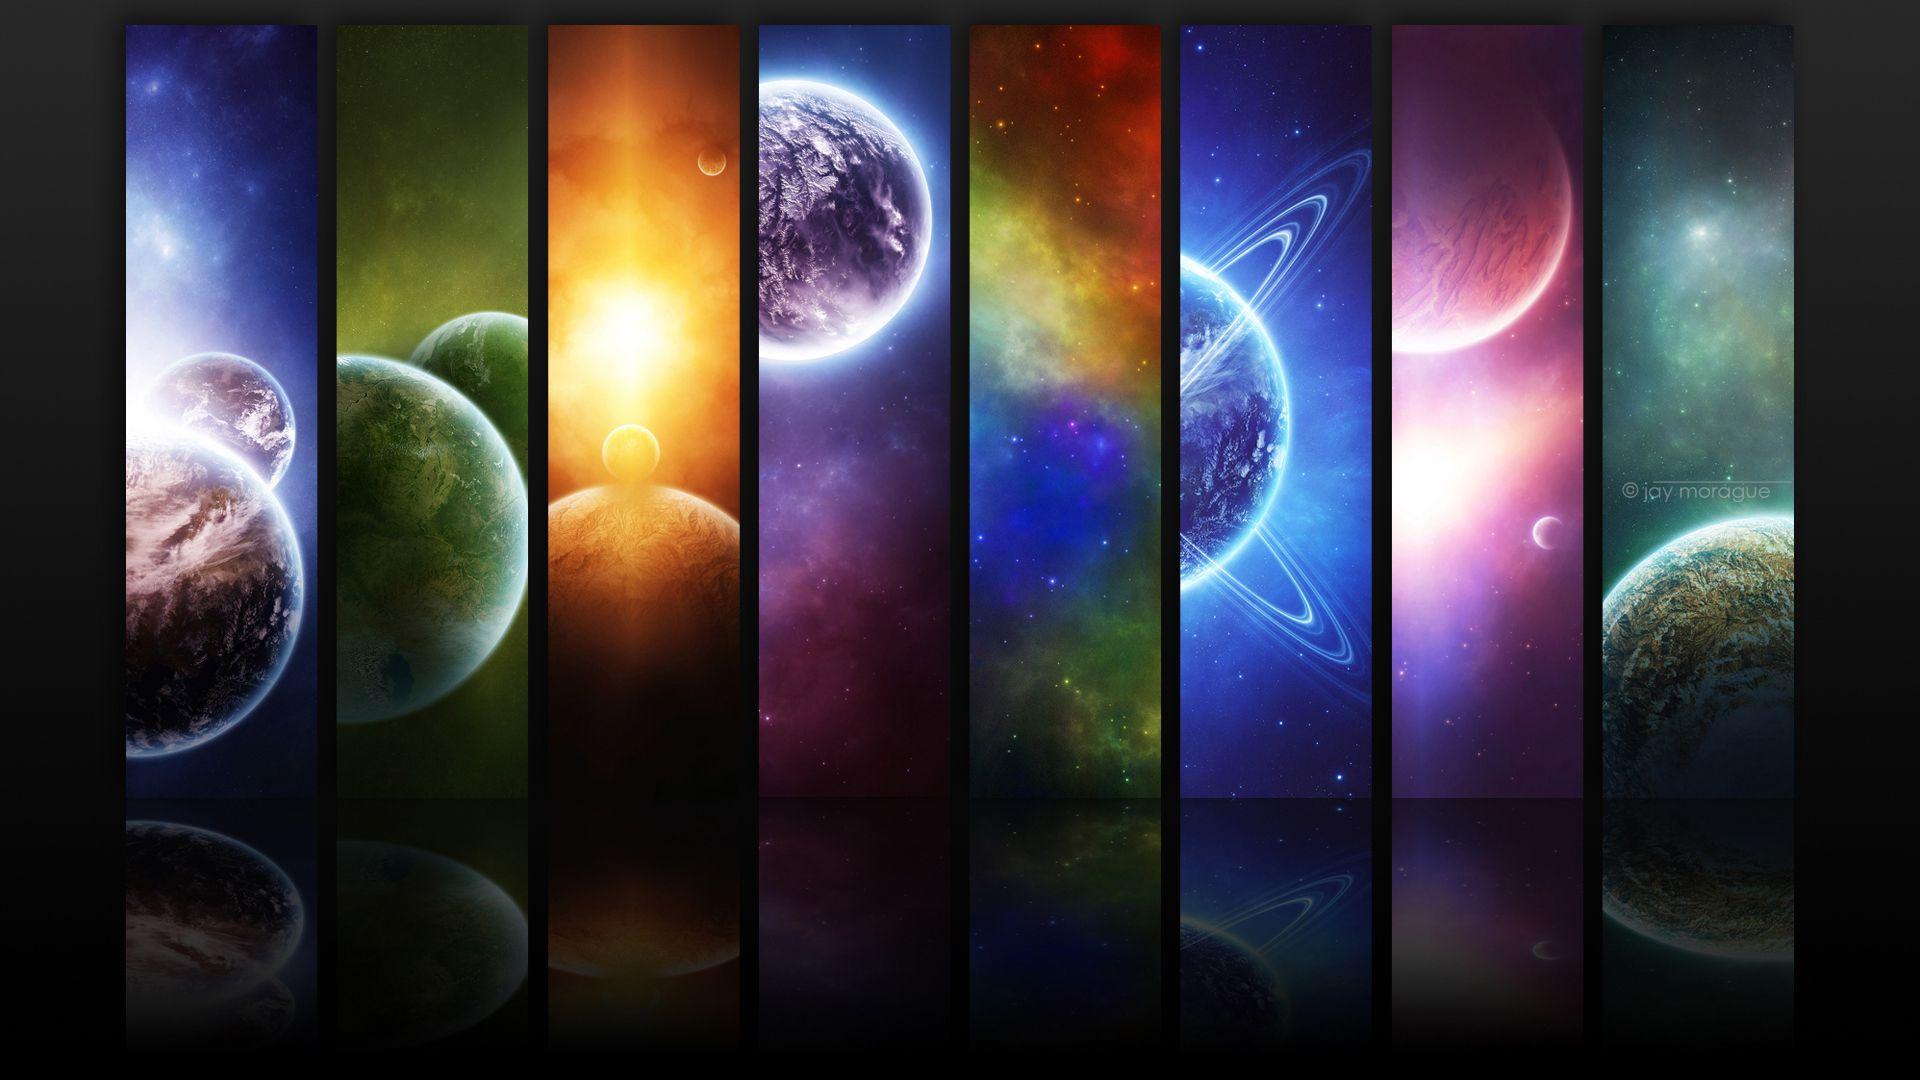 cool planet backgrounds wallpaper 1920 1080 planet wallpaper 53